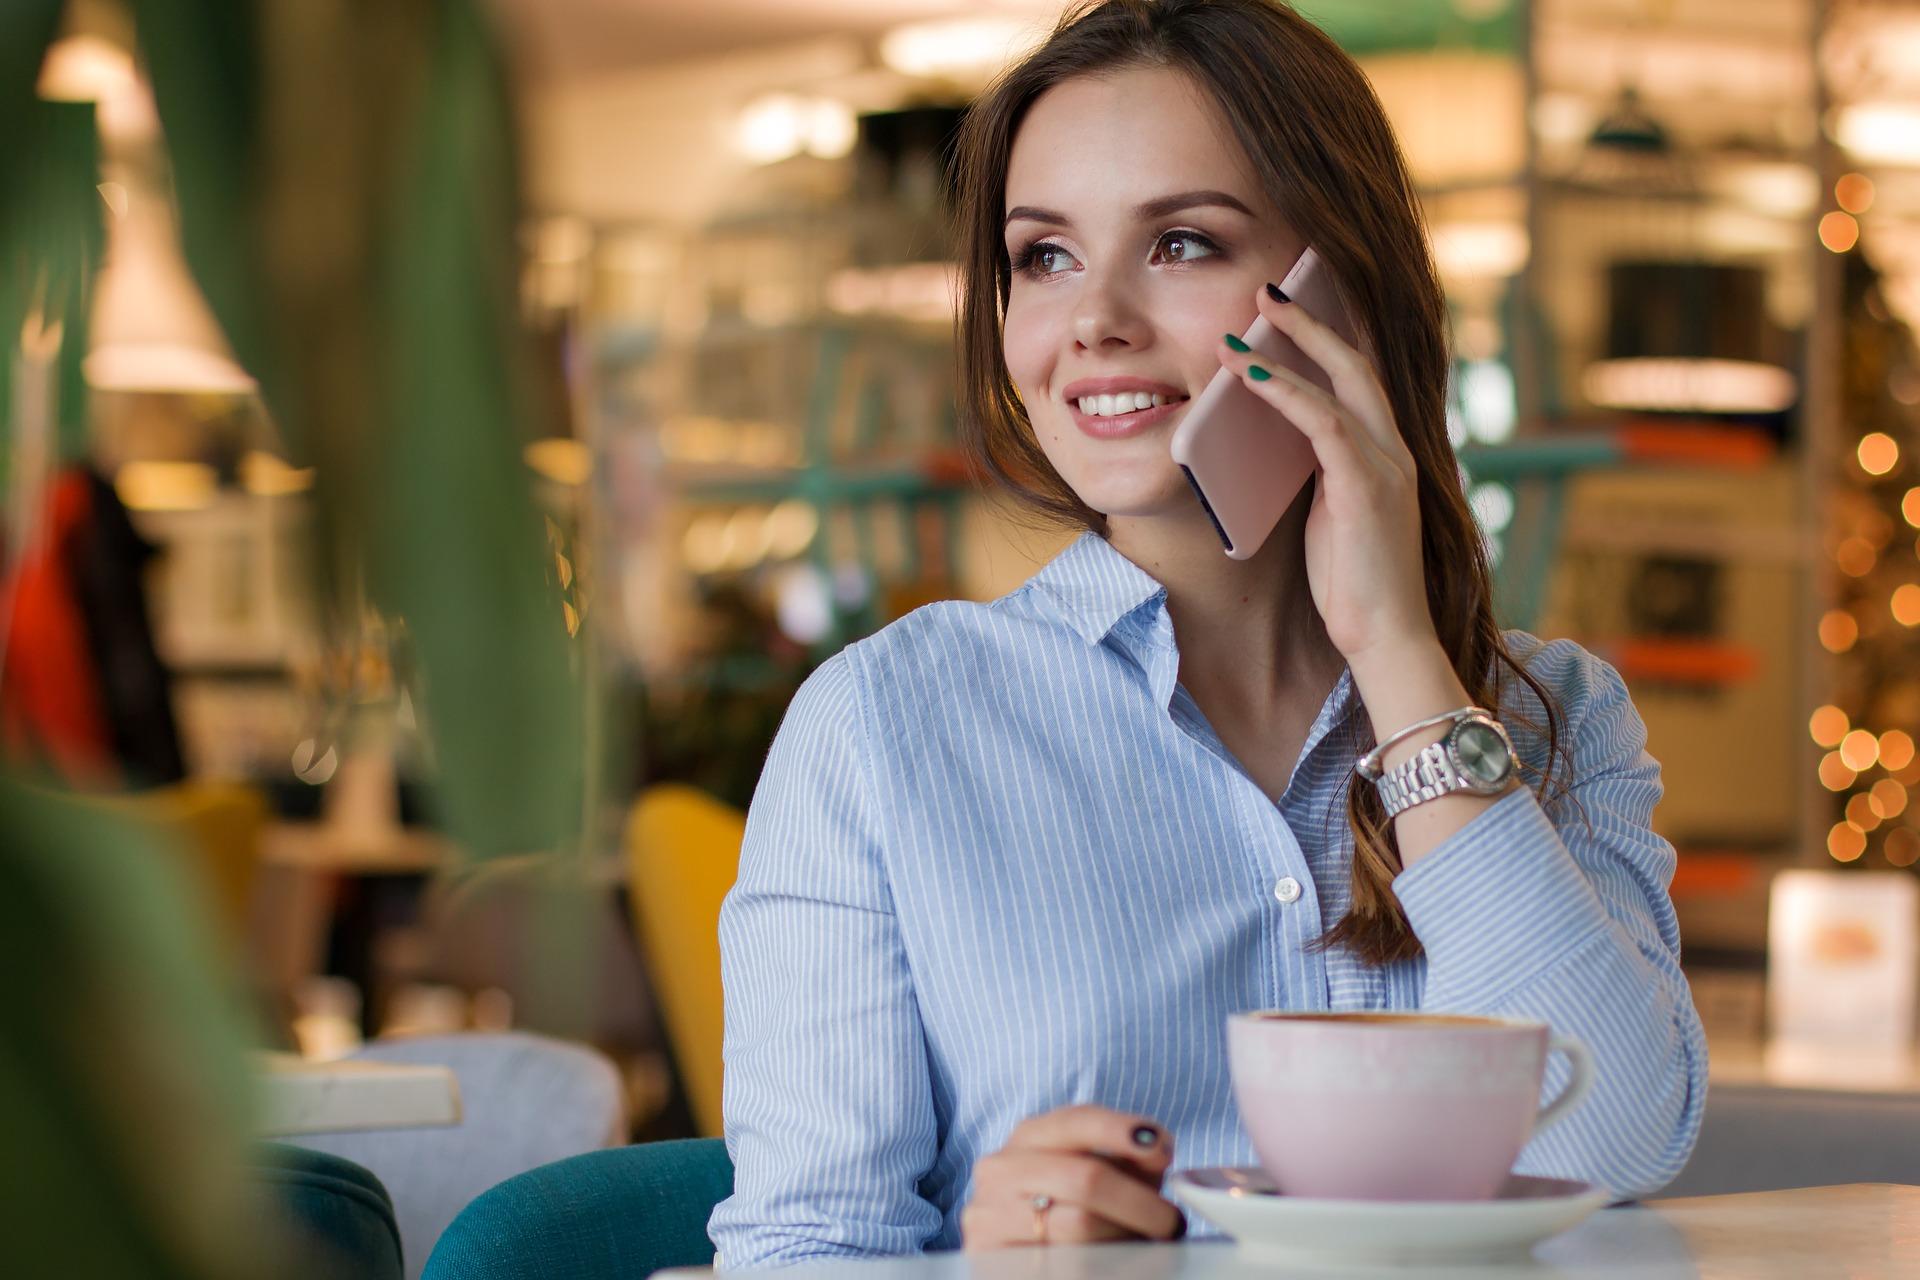 Картинка девушка с телефоном, месяцев